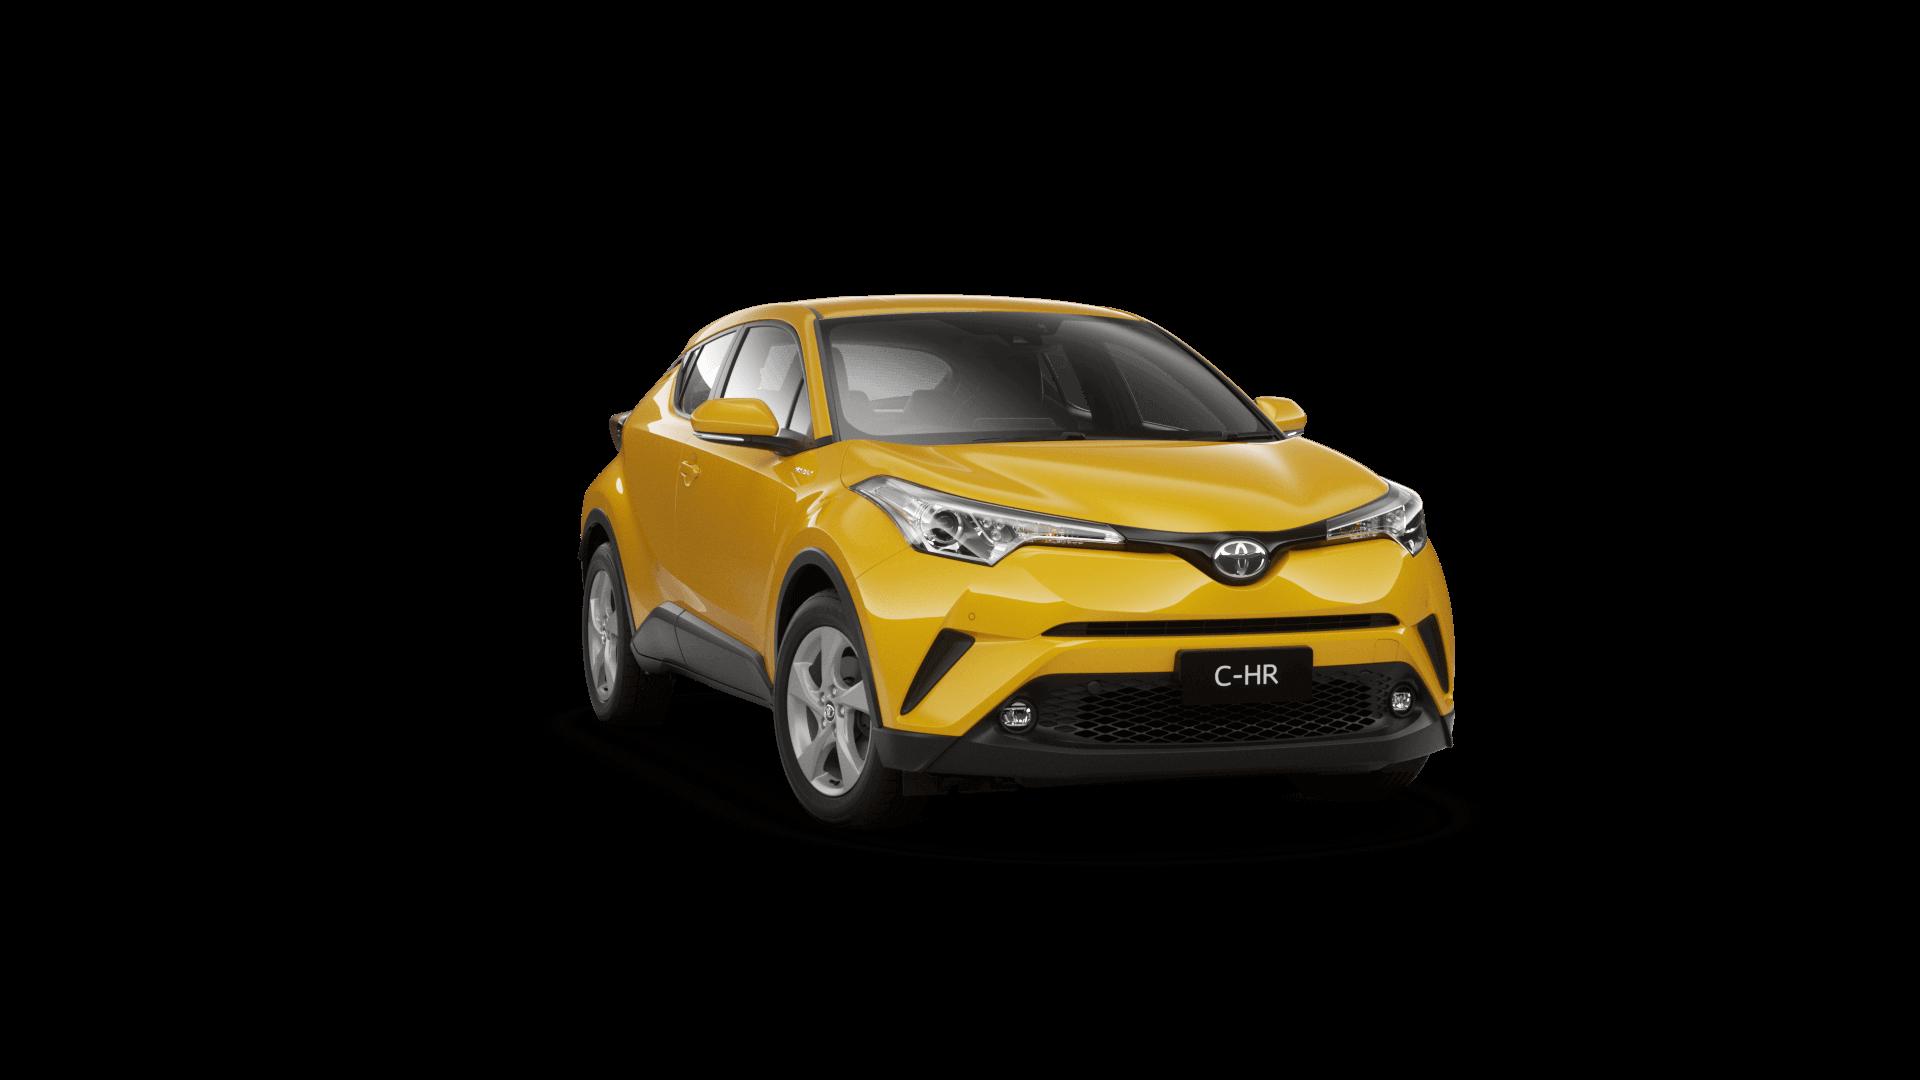 C-HR 2WD <span>Petrol | Auto CVT</span>